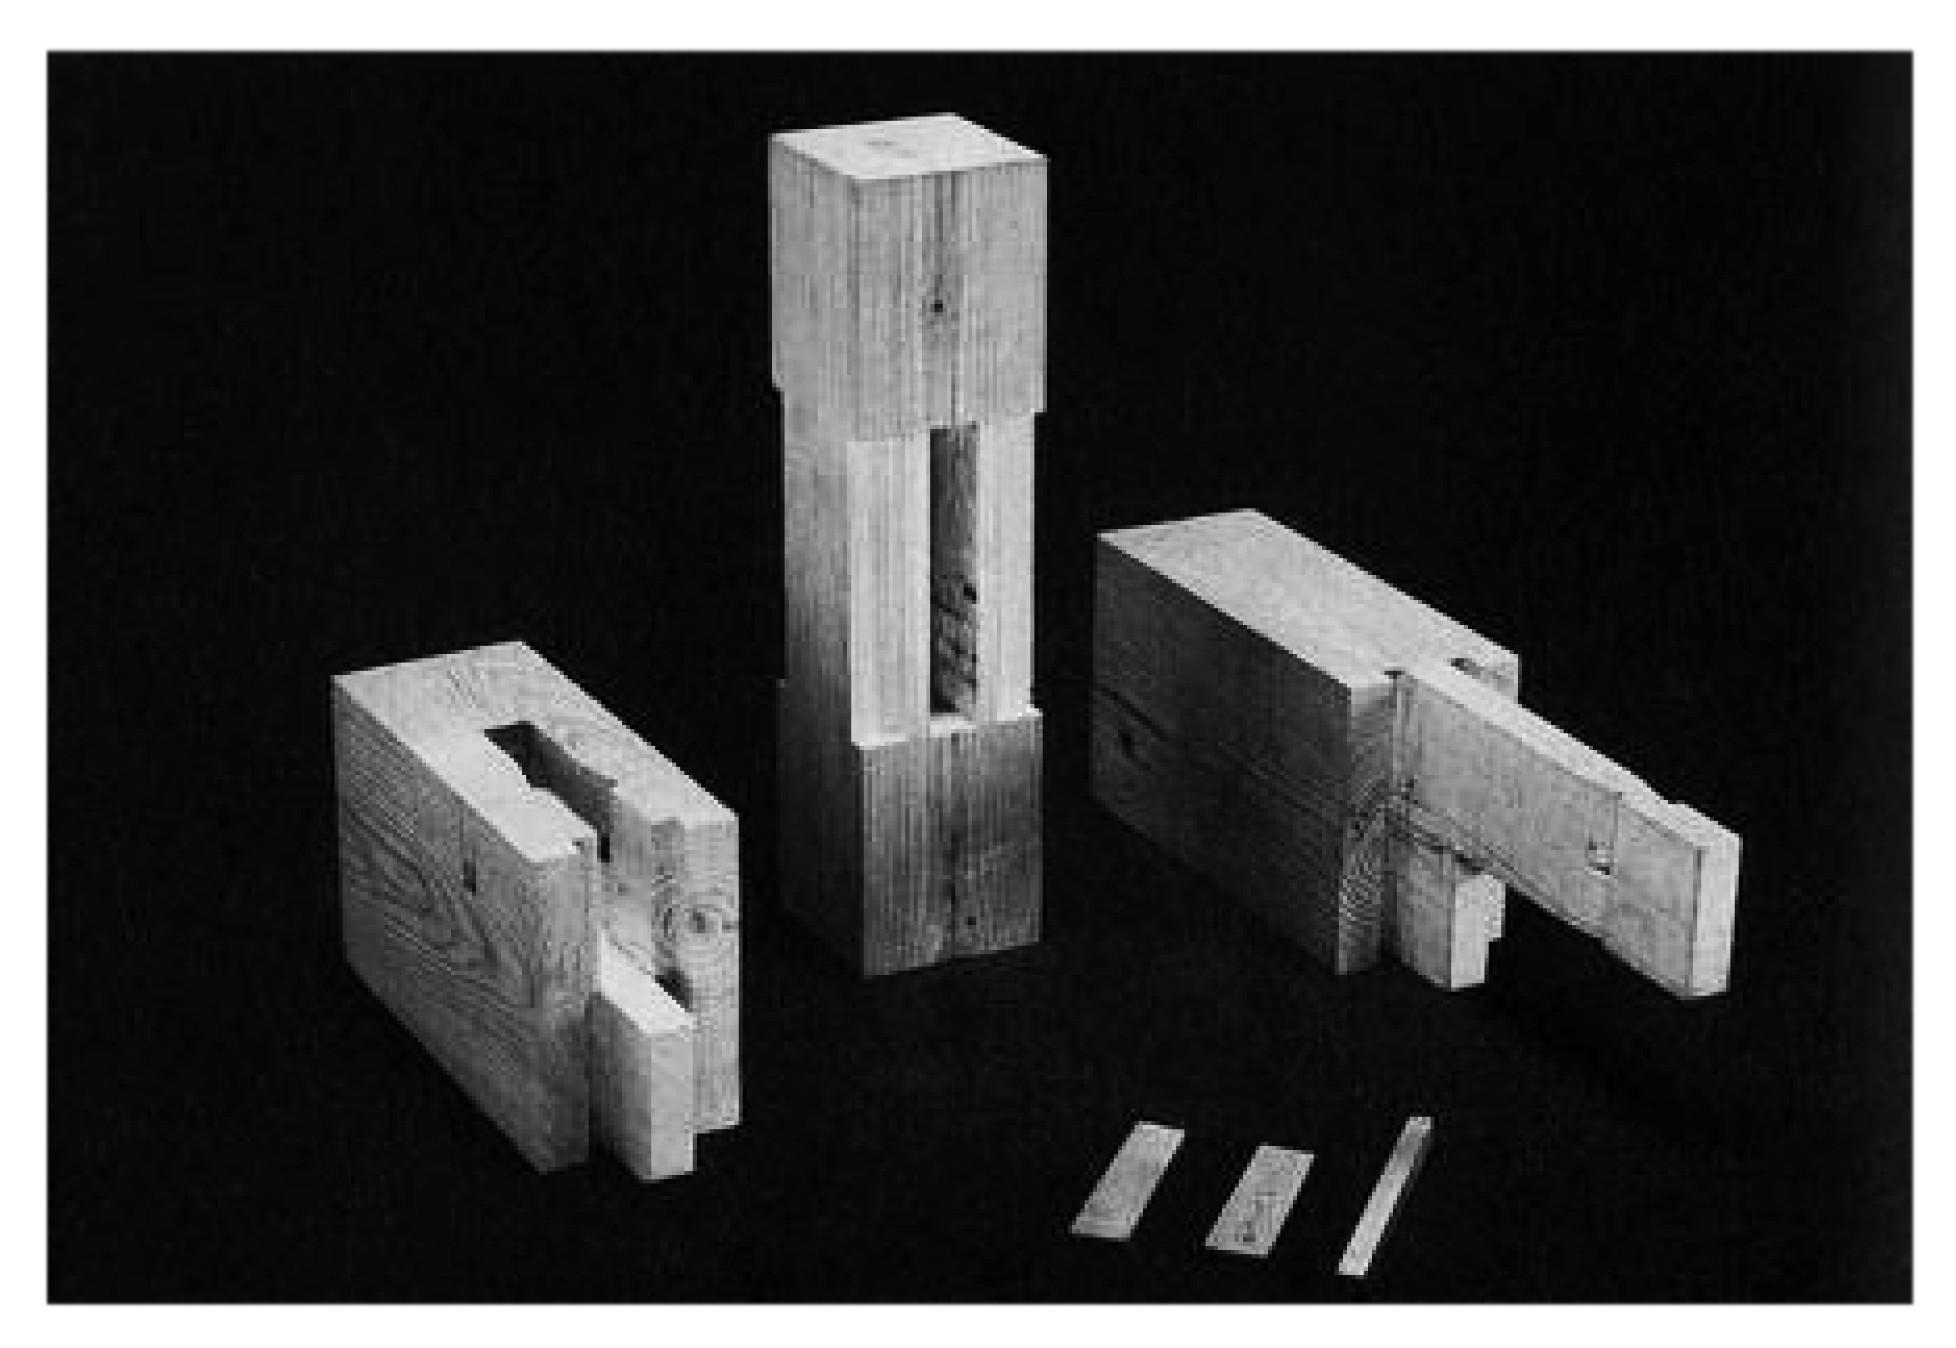 Empalme de doble clavija. Image Courtesy of Torashichi Sumiyoshi y Gengo Matsui